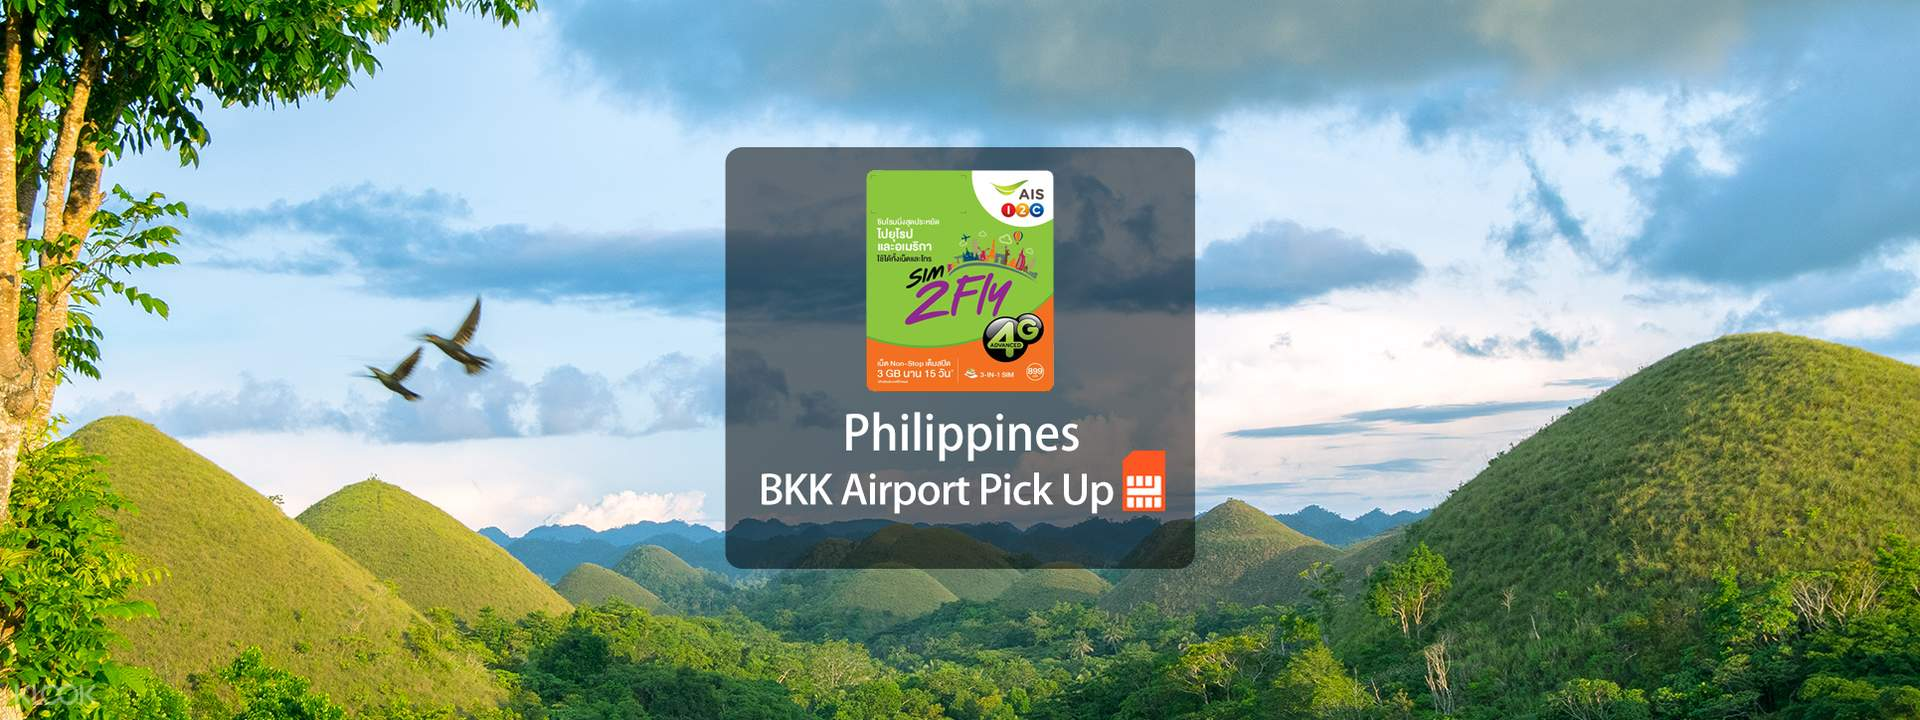 "Philippines Prepaid 4G SIM Card (BKK Airport Pick Up) from AIS"""